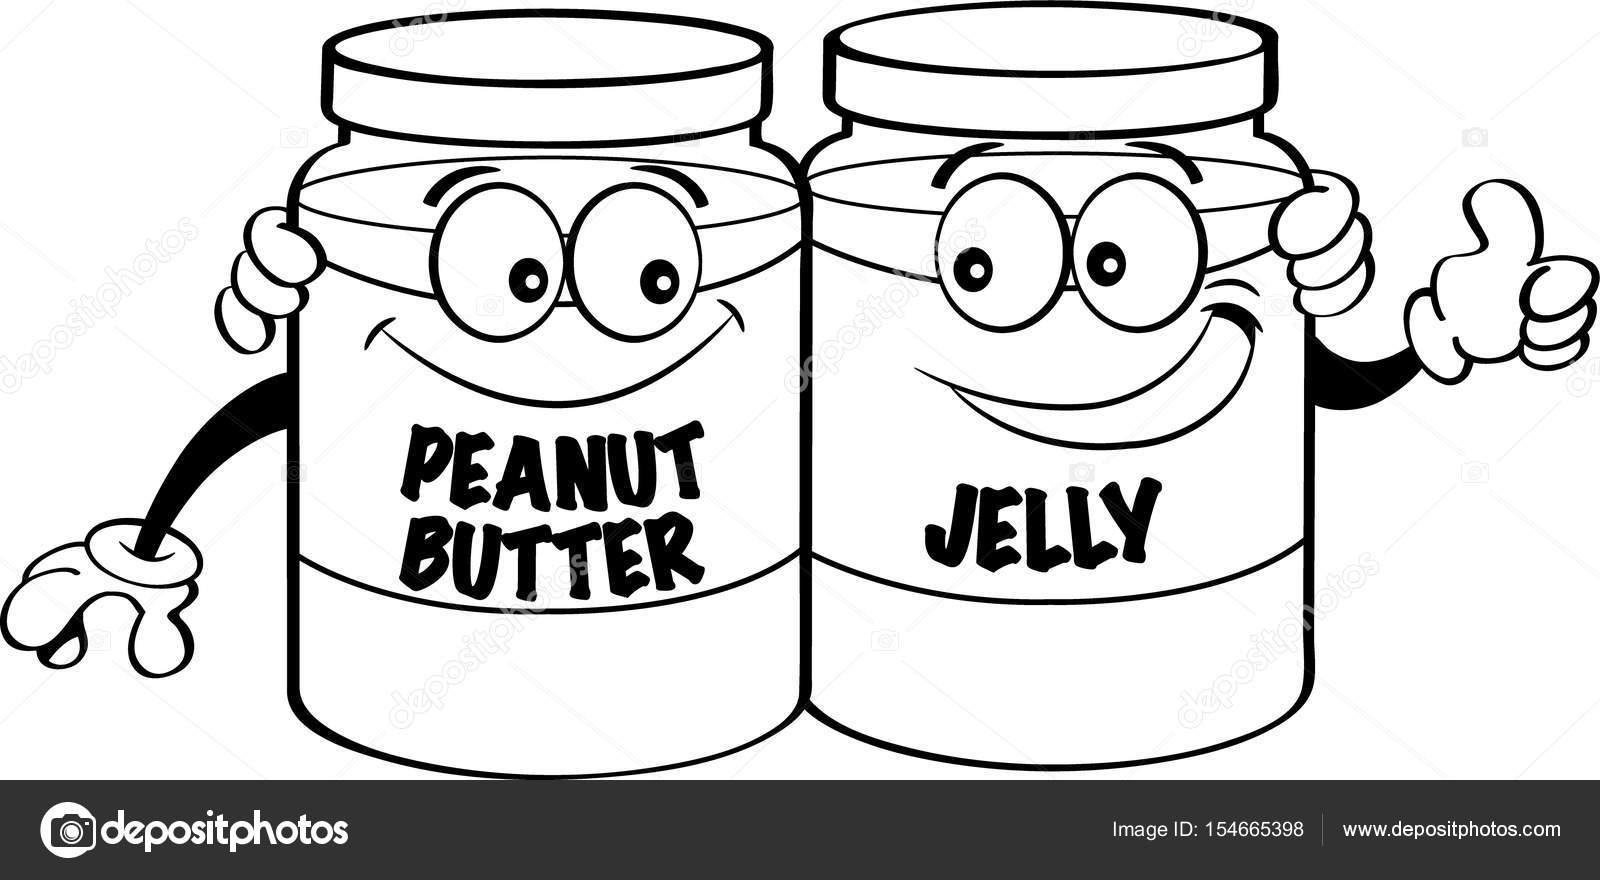 1600x880 Cartoon Illustration Of Peanut Butter And Jelly Jars. Stock